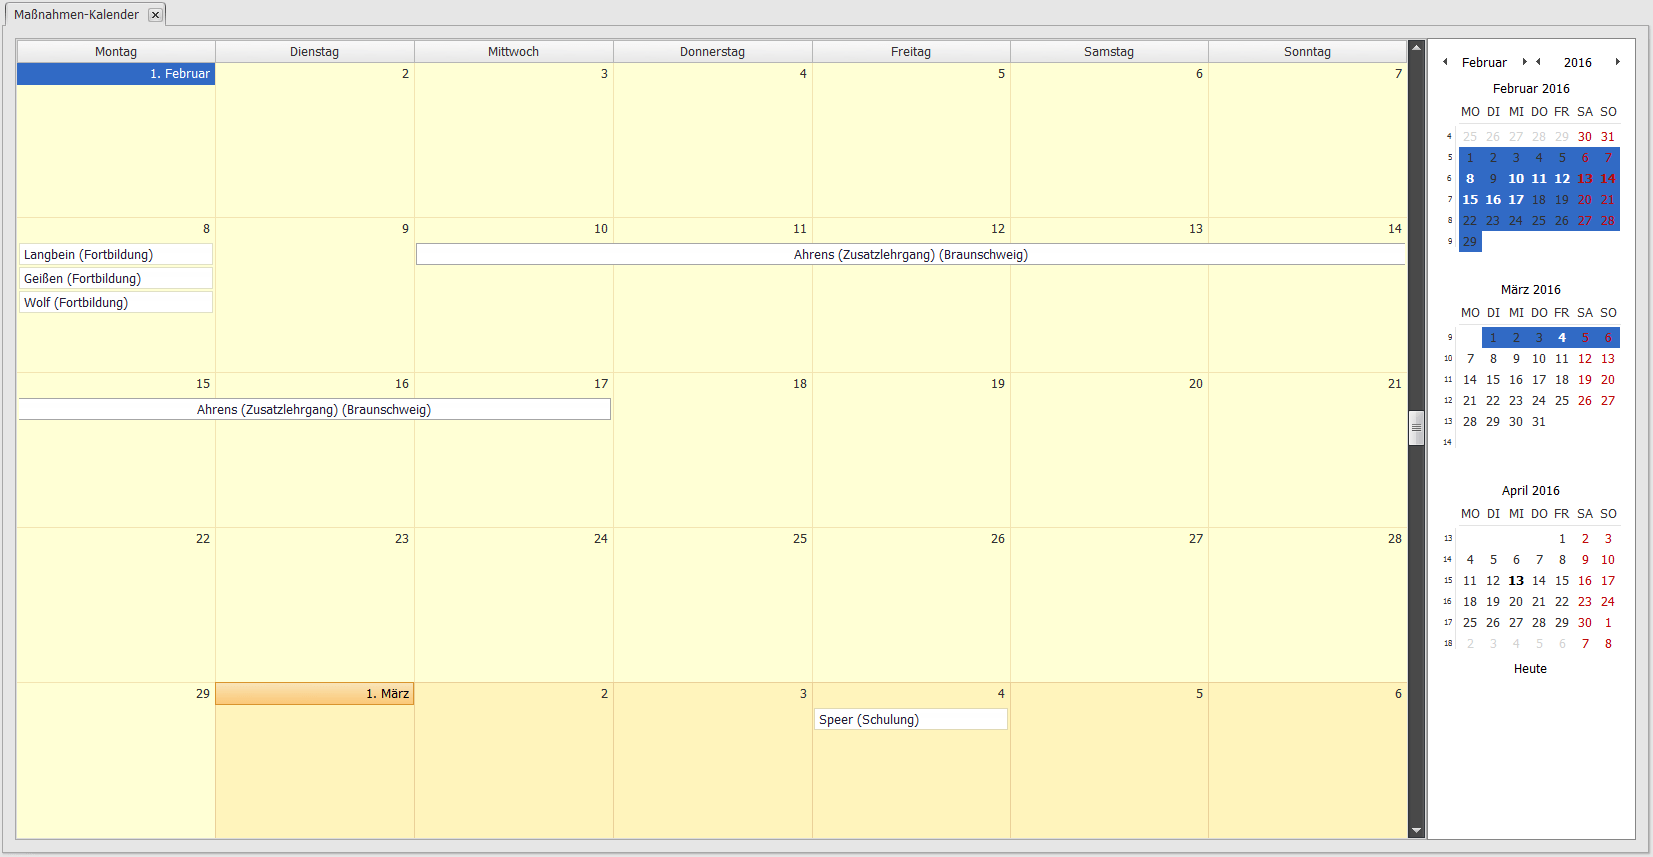 Maßnahmenkalender